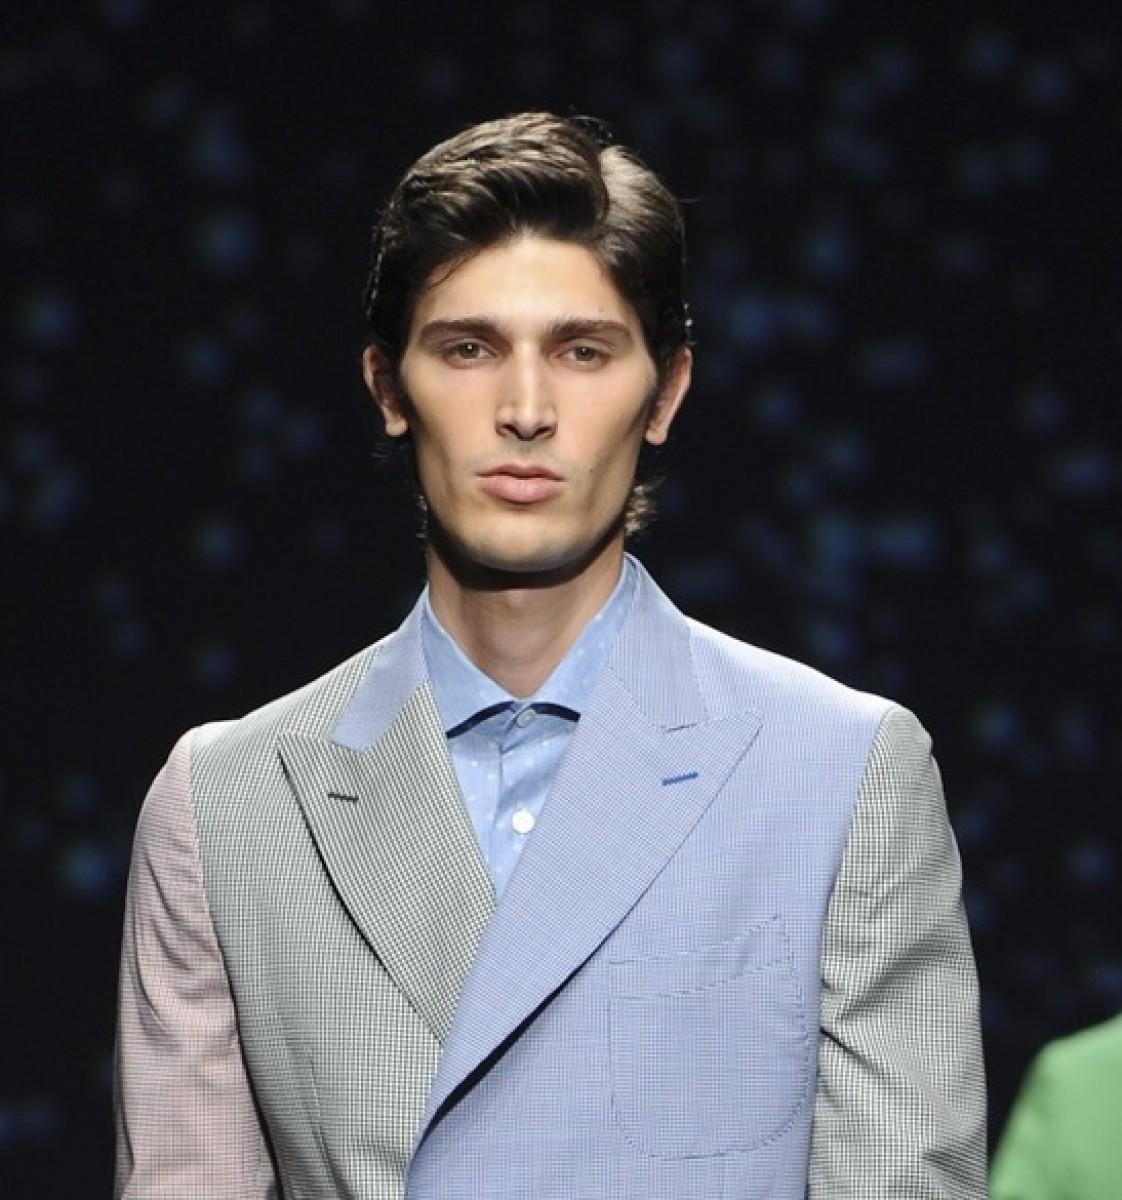 Klasyczna a elegancka moda męska – męska elegancja a modny mężczyzna – BaBylis-totallook.pl